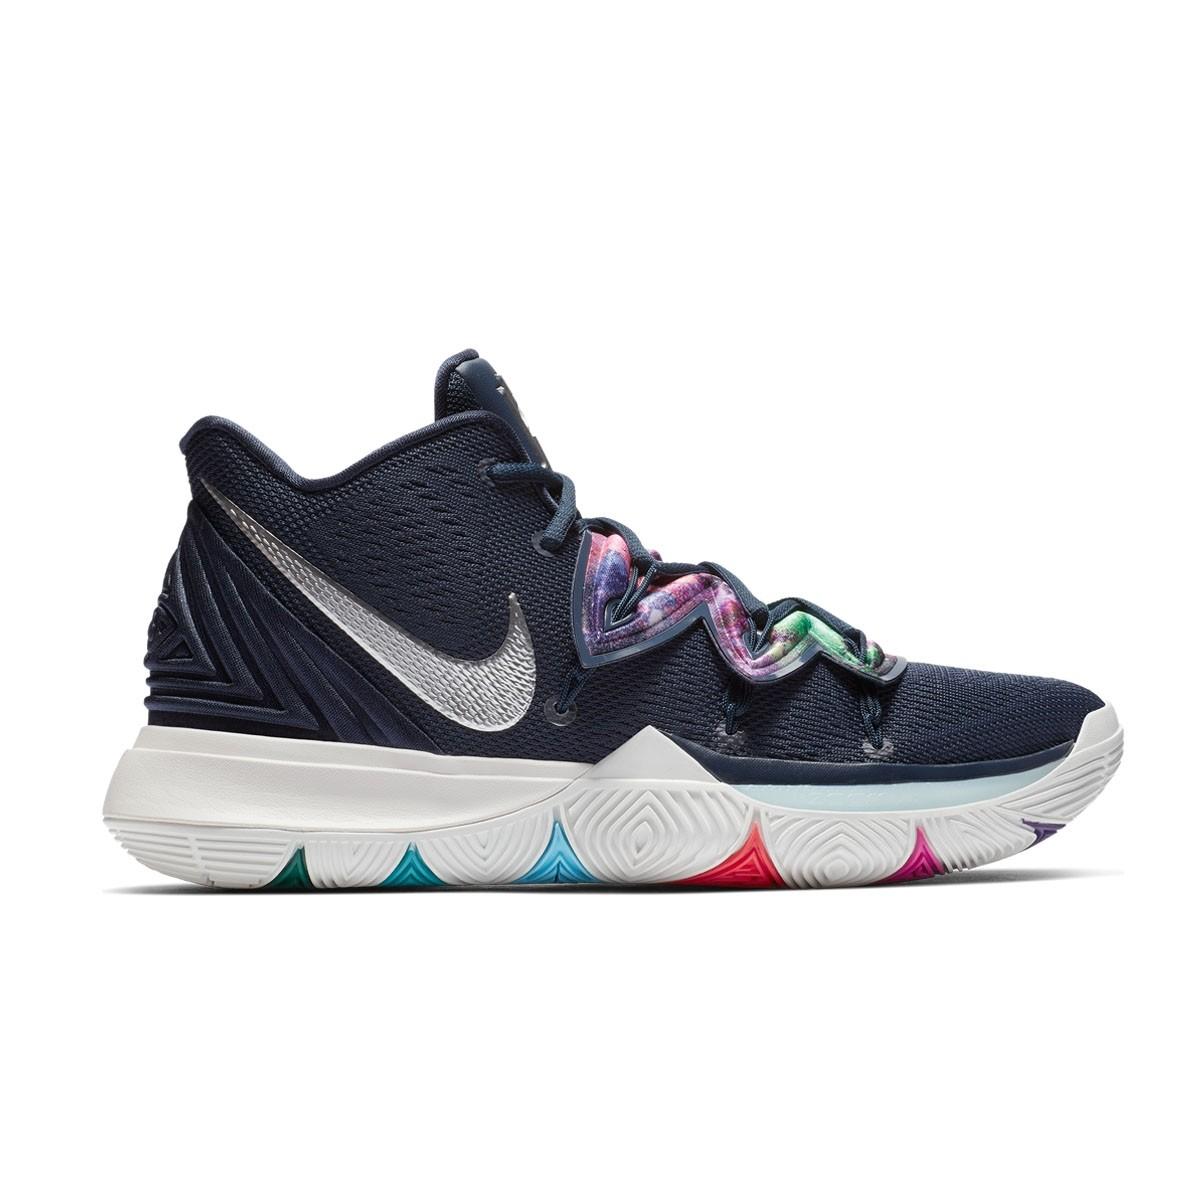 Nike Kyrie 5 'Multicolor'